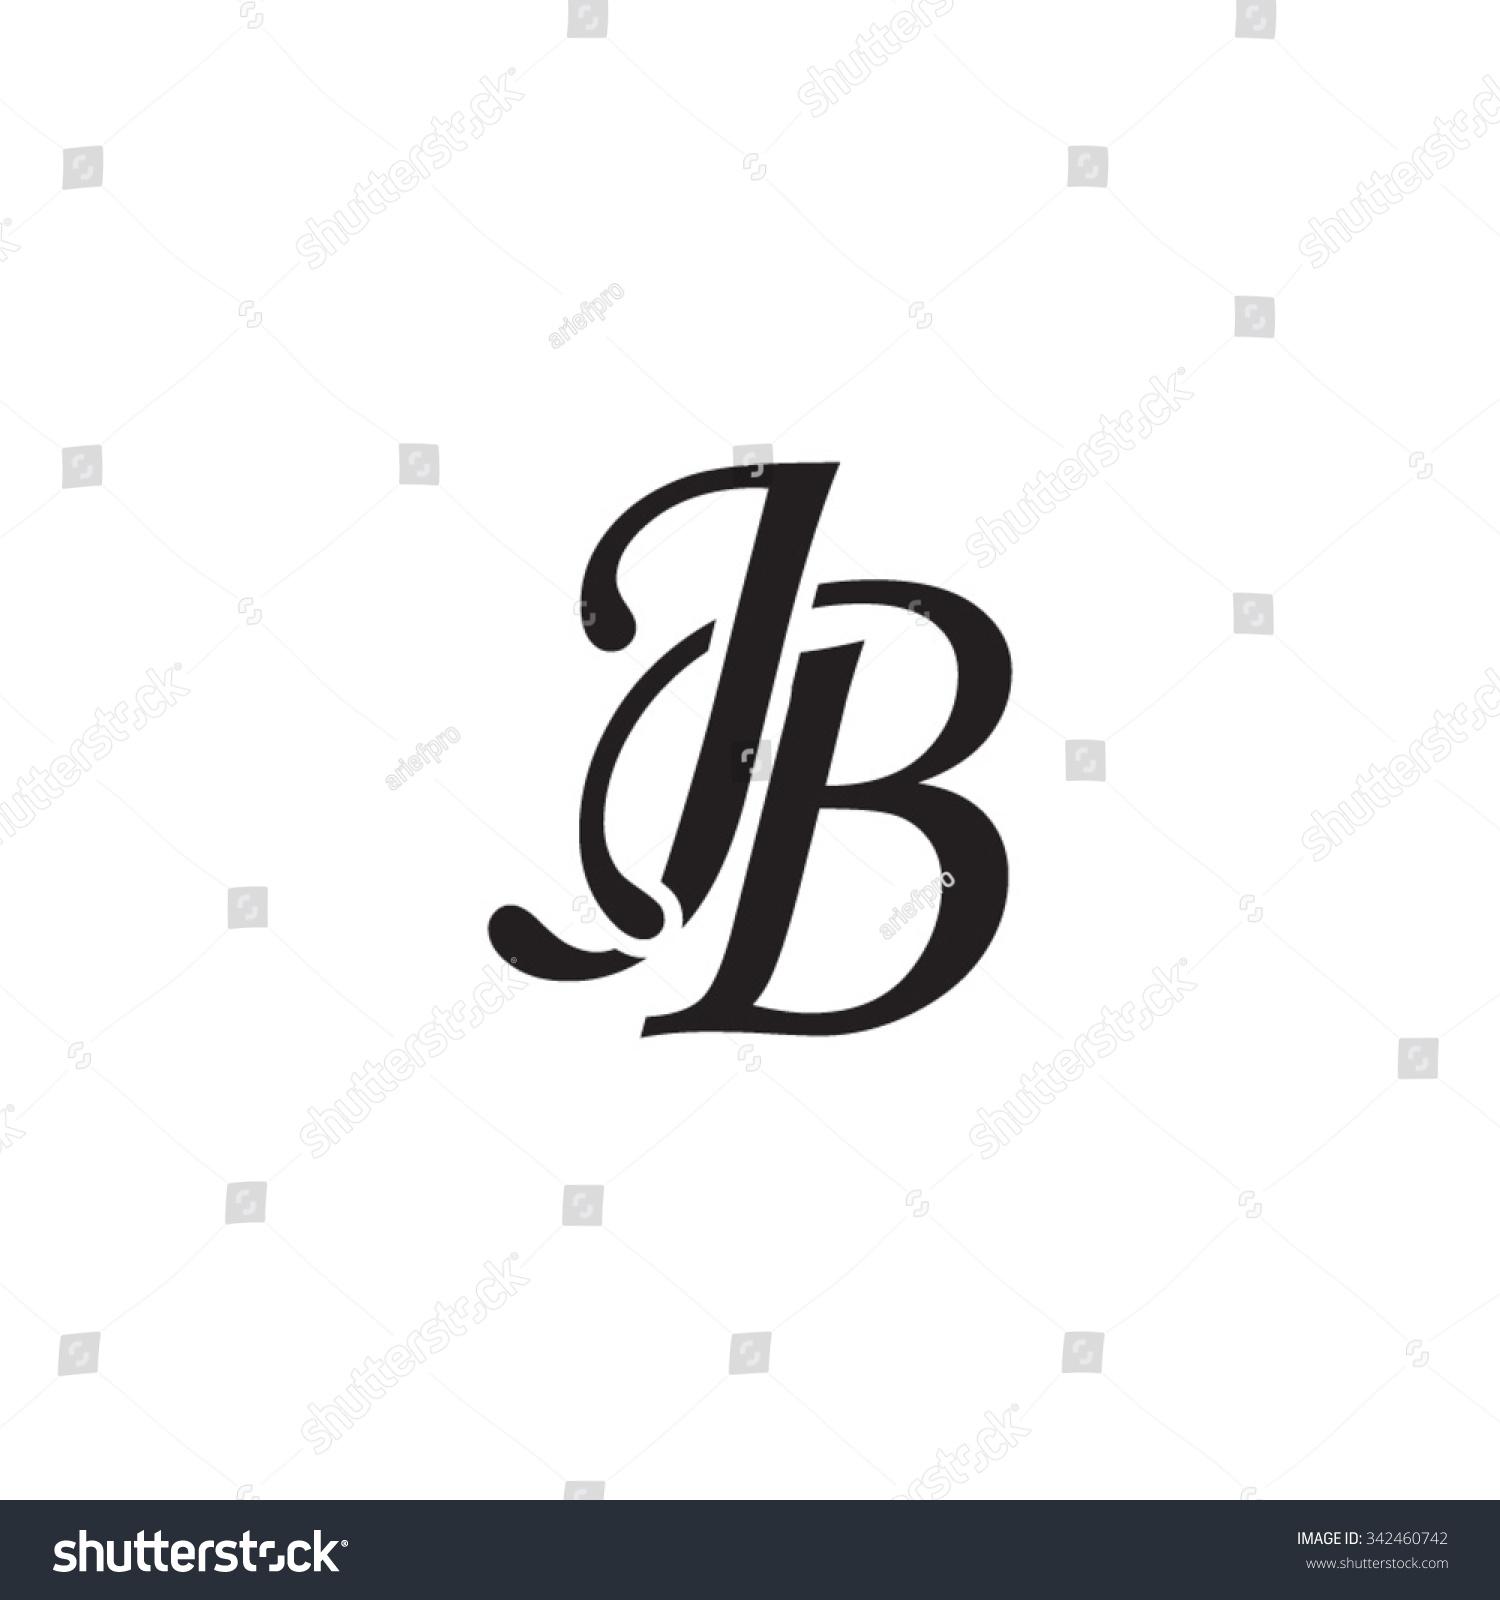 jb initial monogram logo stock vector 342460742 shutterstock